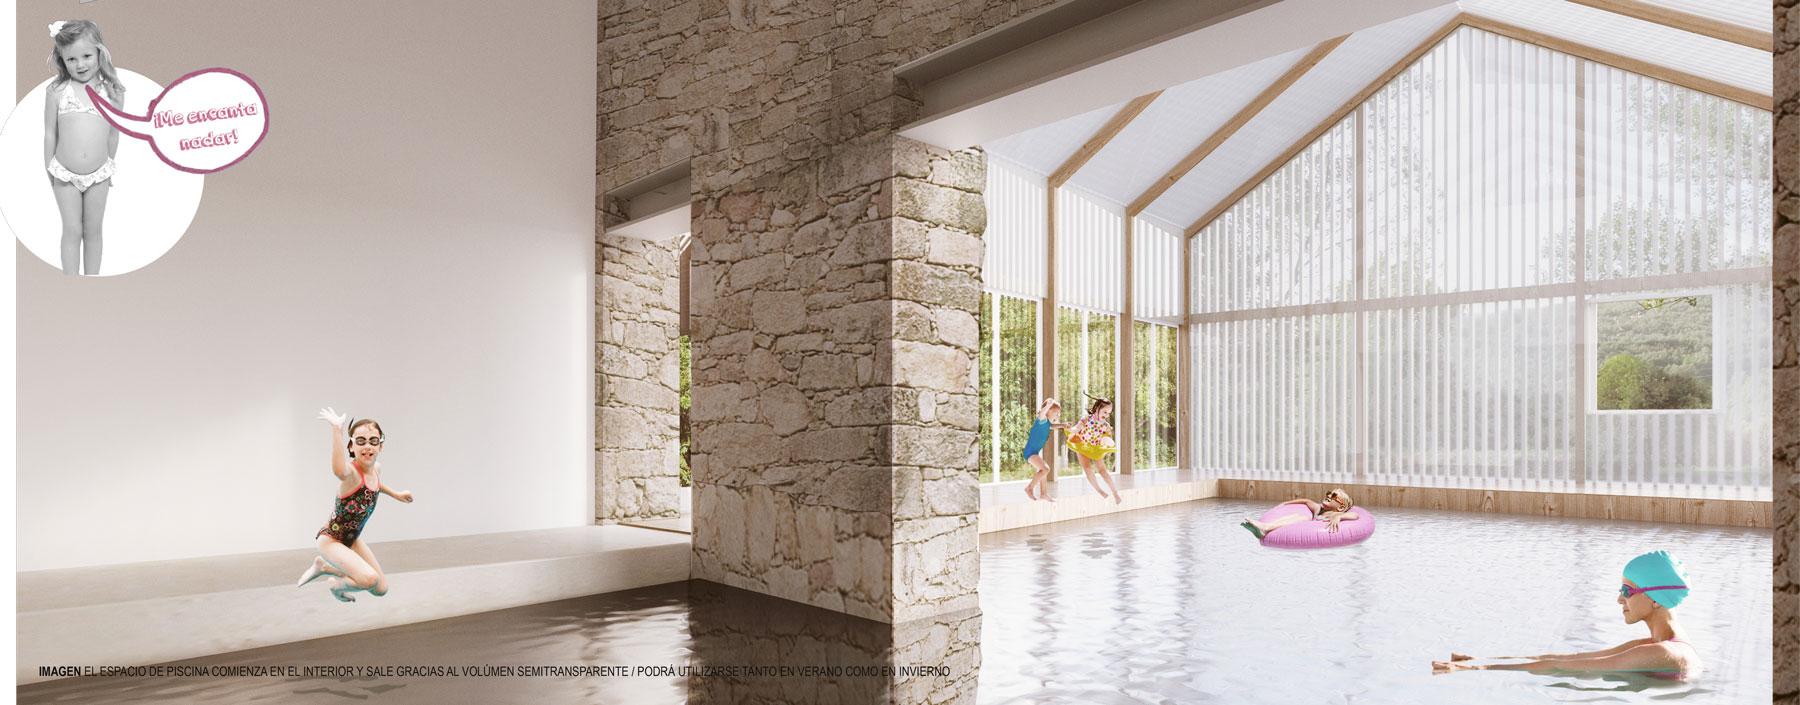 AJO arquitectos concurso padornelo piscina